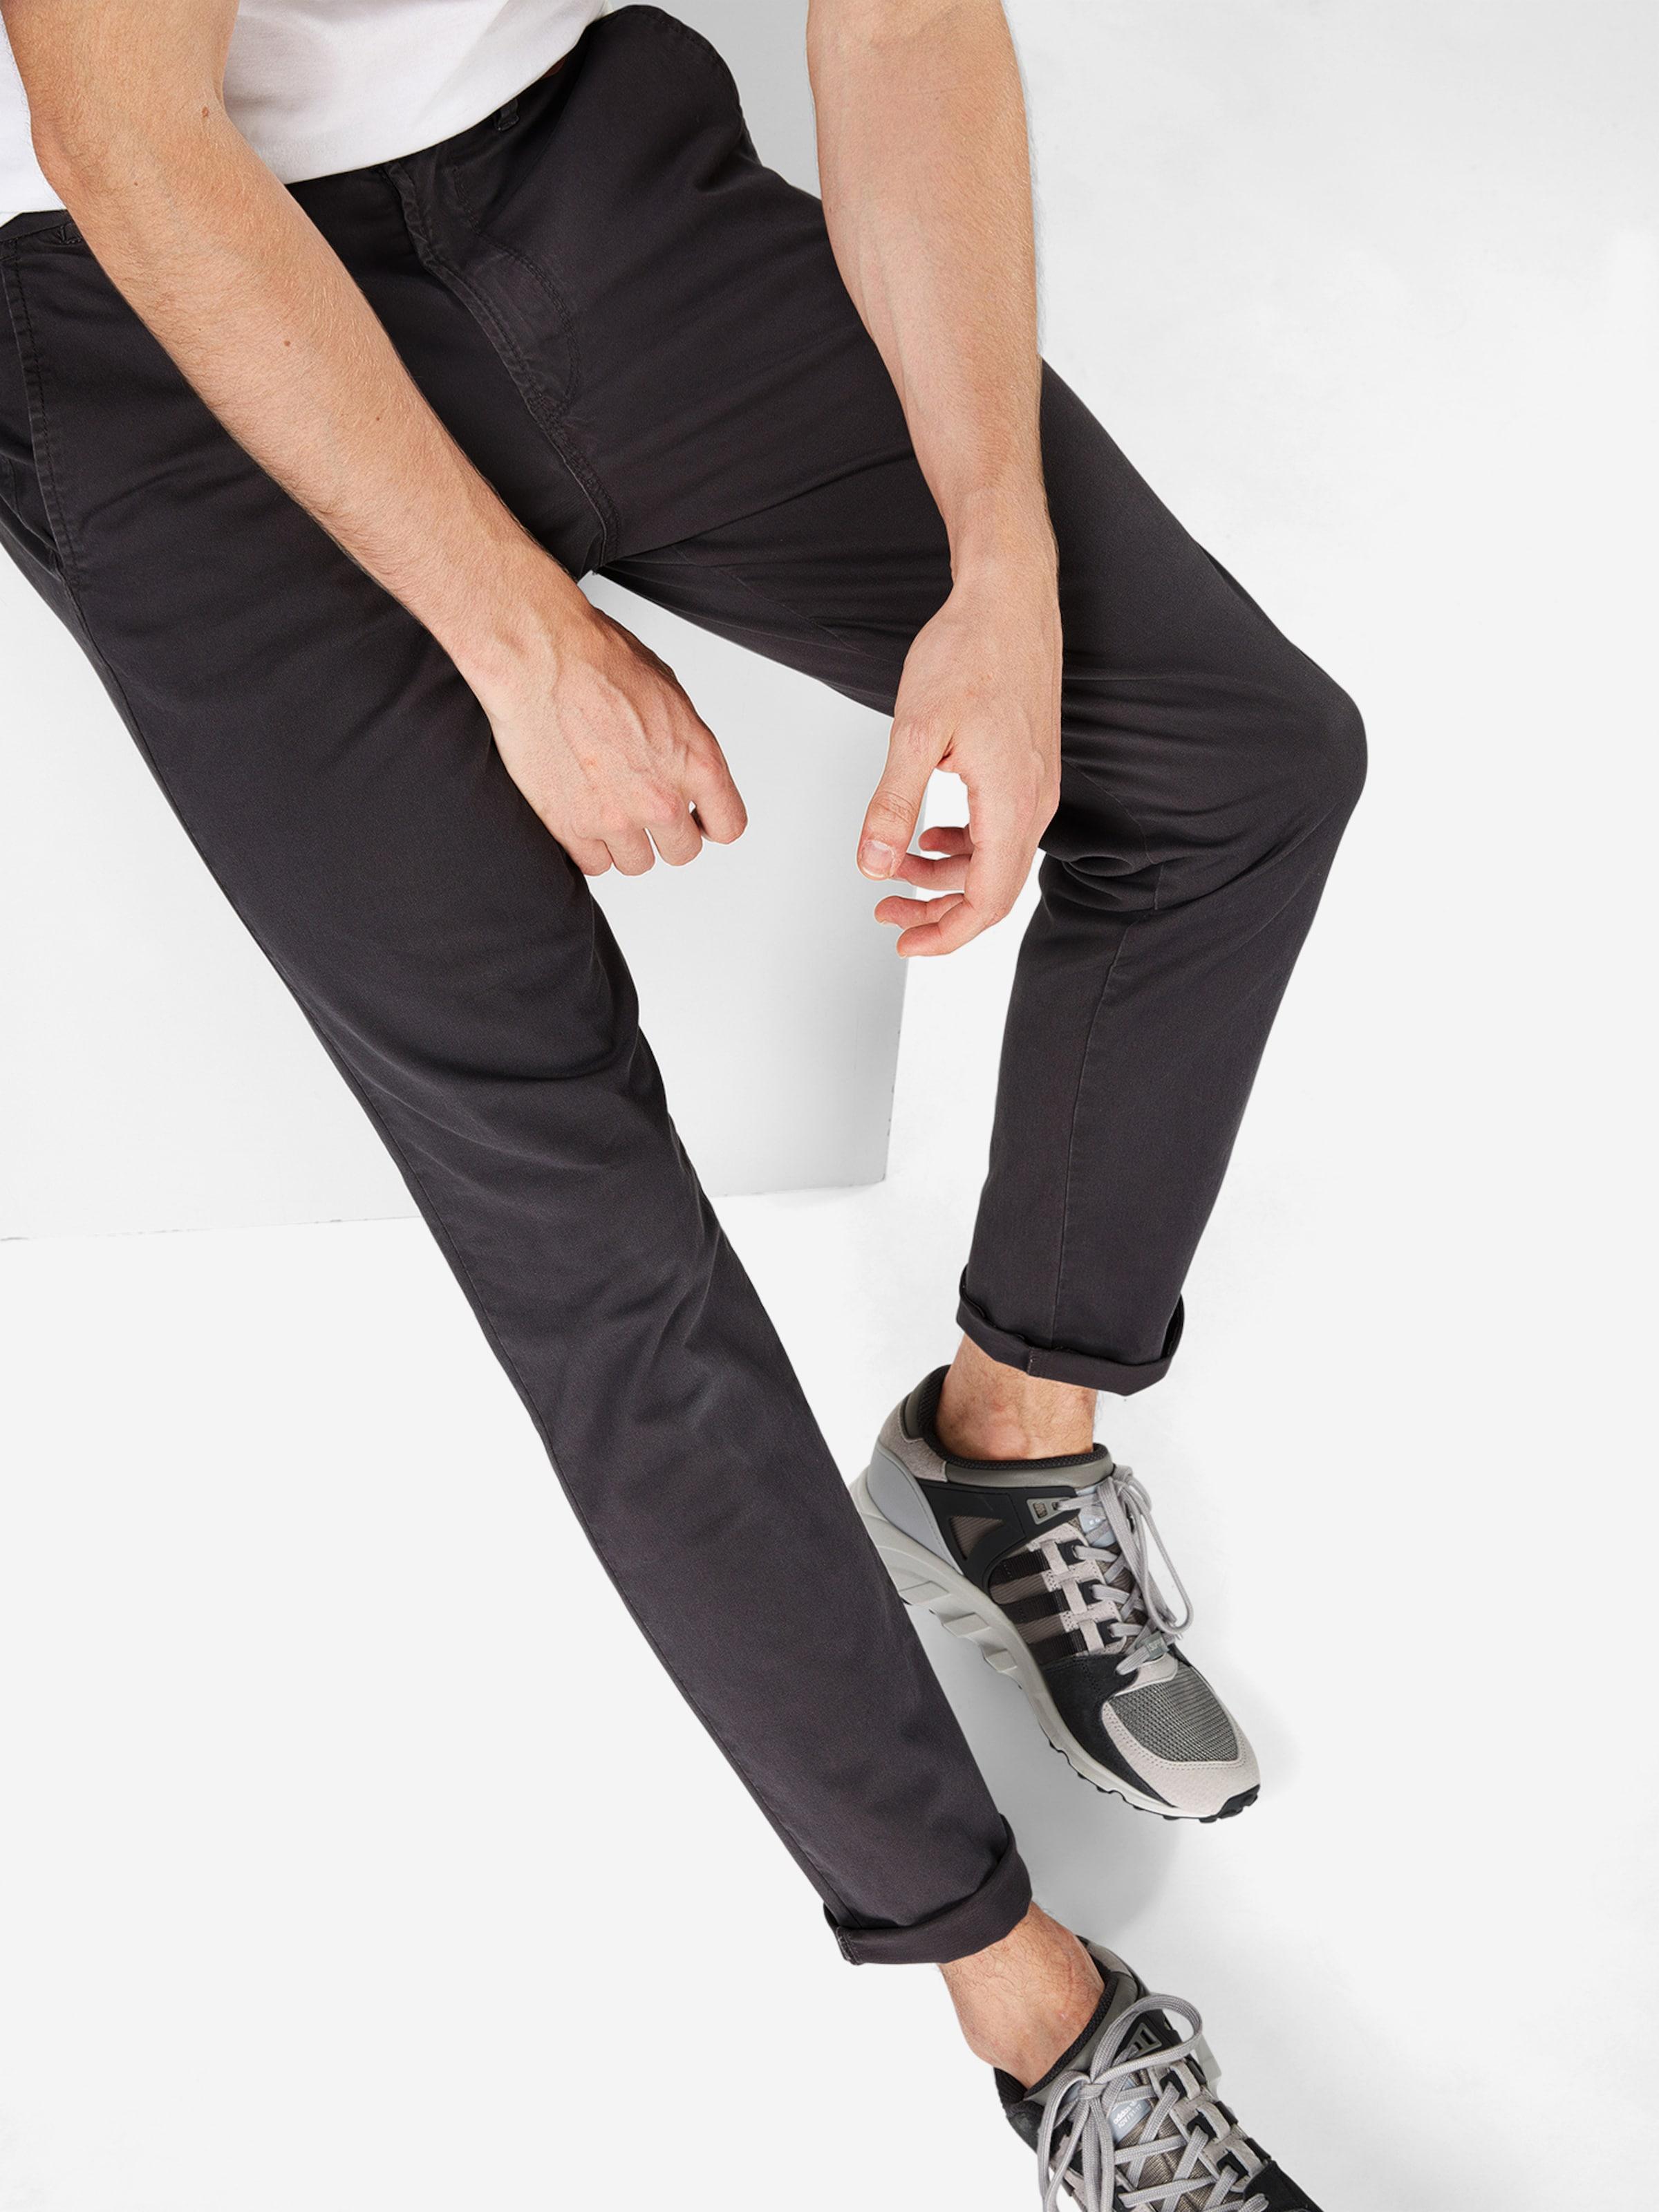 En Gris 'jjicody Foncé Jackamp; Grey Jjspencer Dark Noos' Jones Pantalon Chino Ww E9YebWDH2I